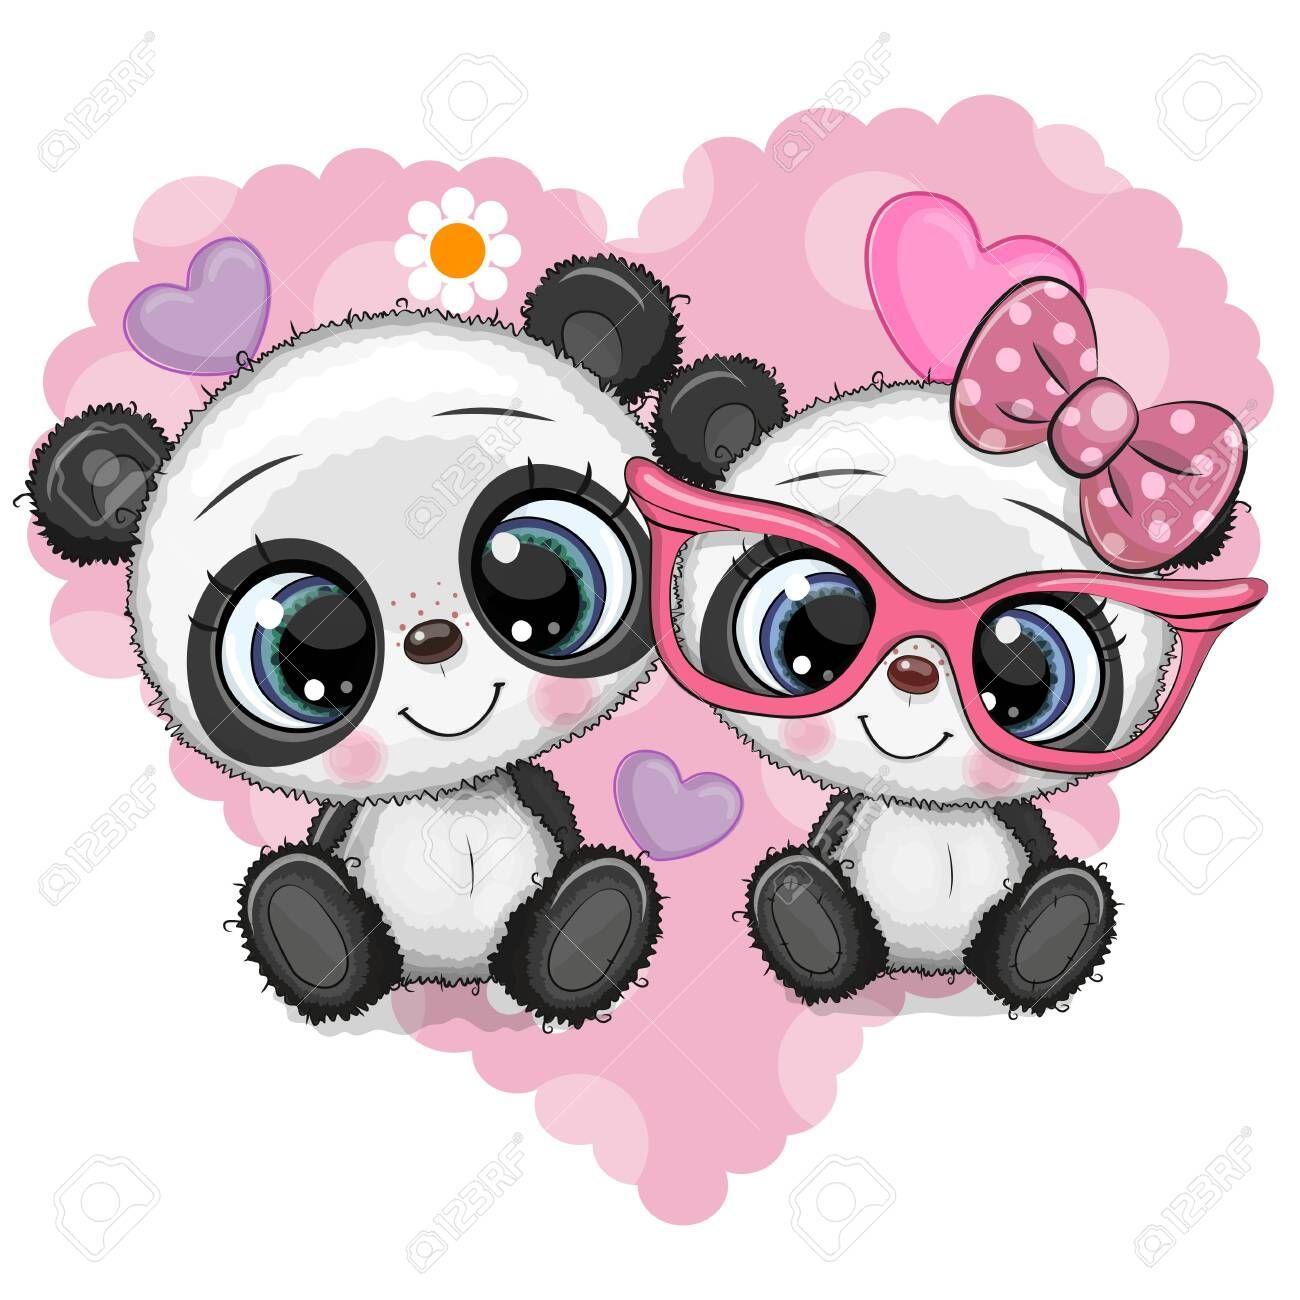 Two Cute Cartoon Pandas On A Heart Background Sponsored Cartoon Cute Pandas Background Heart Cute Panda Wallpaper Cute Panda Cartoon Cartoon Panda